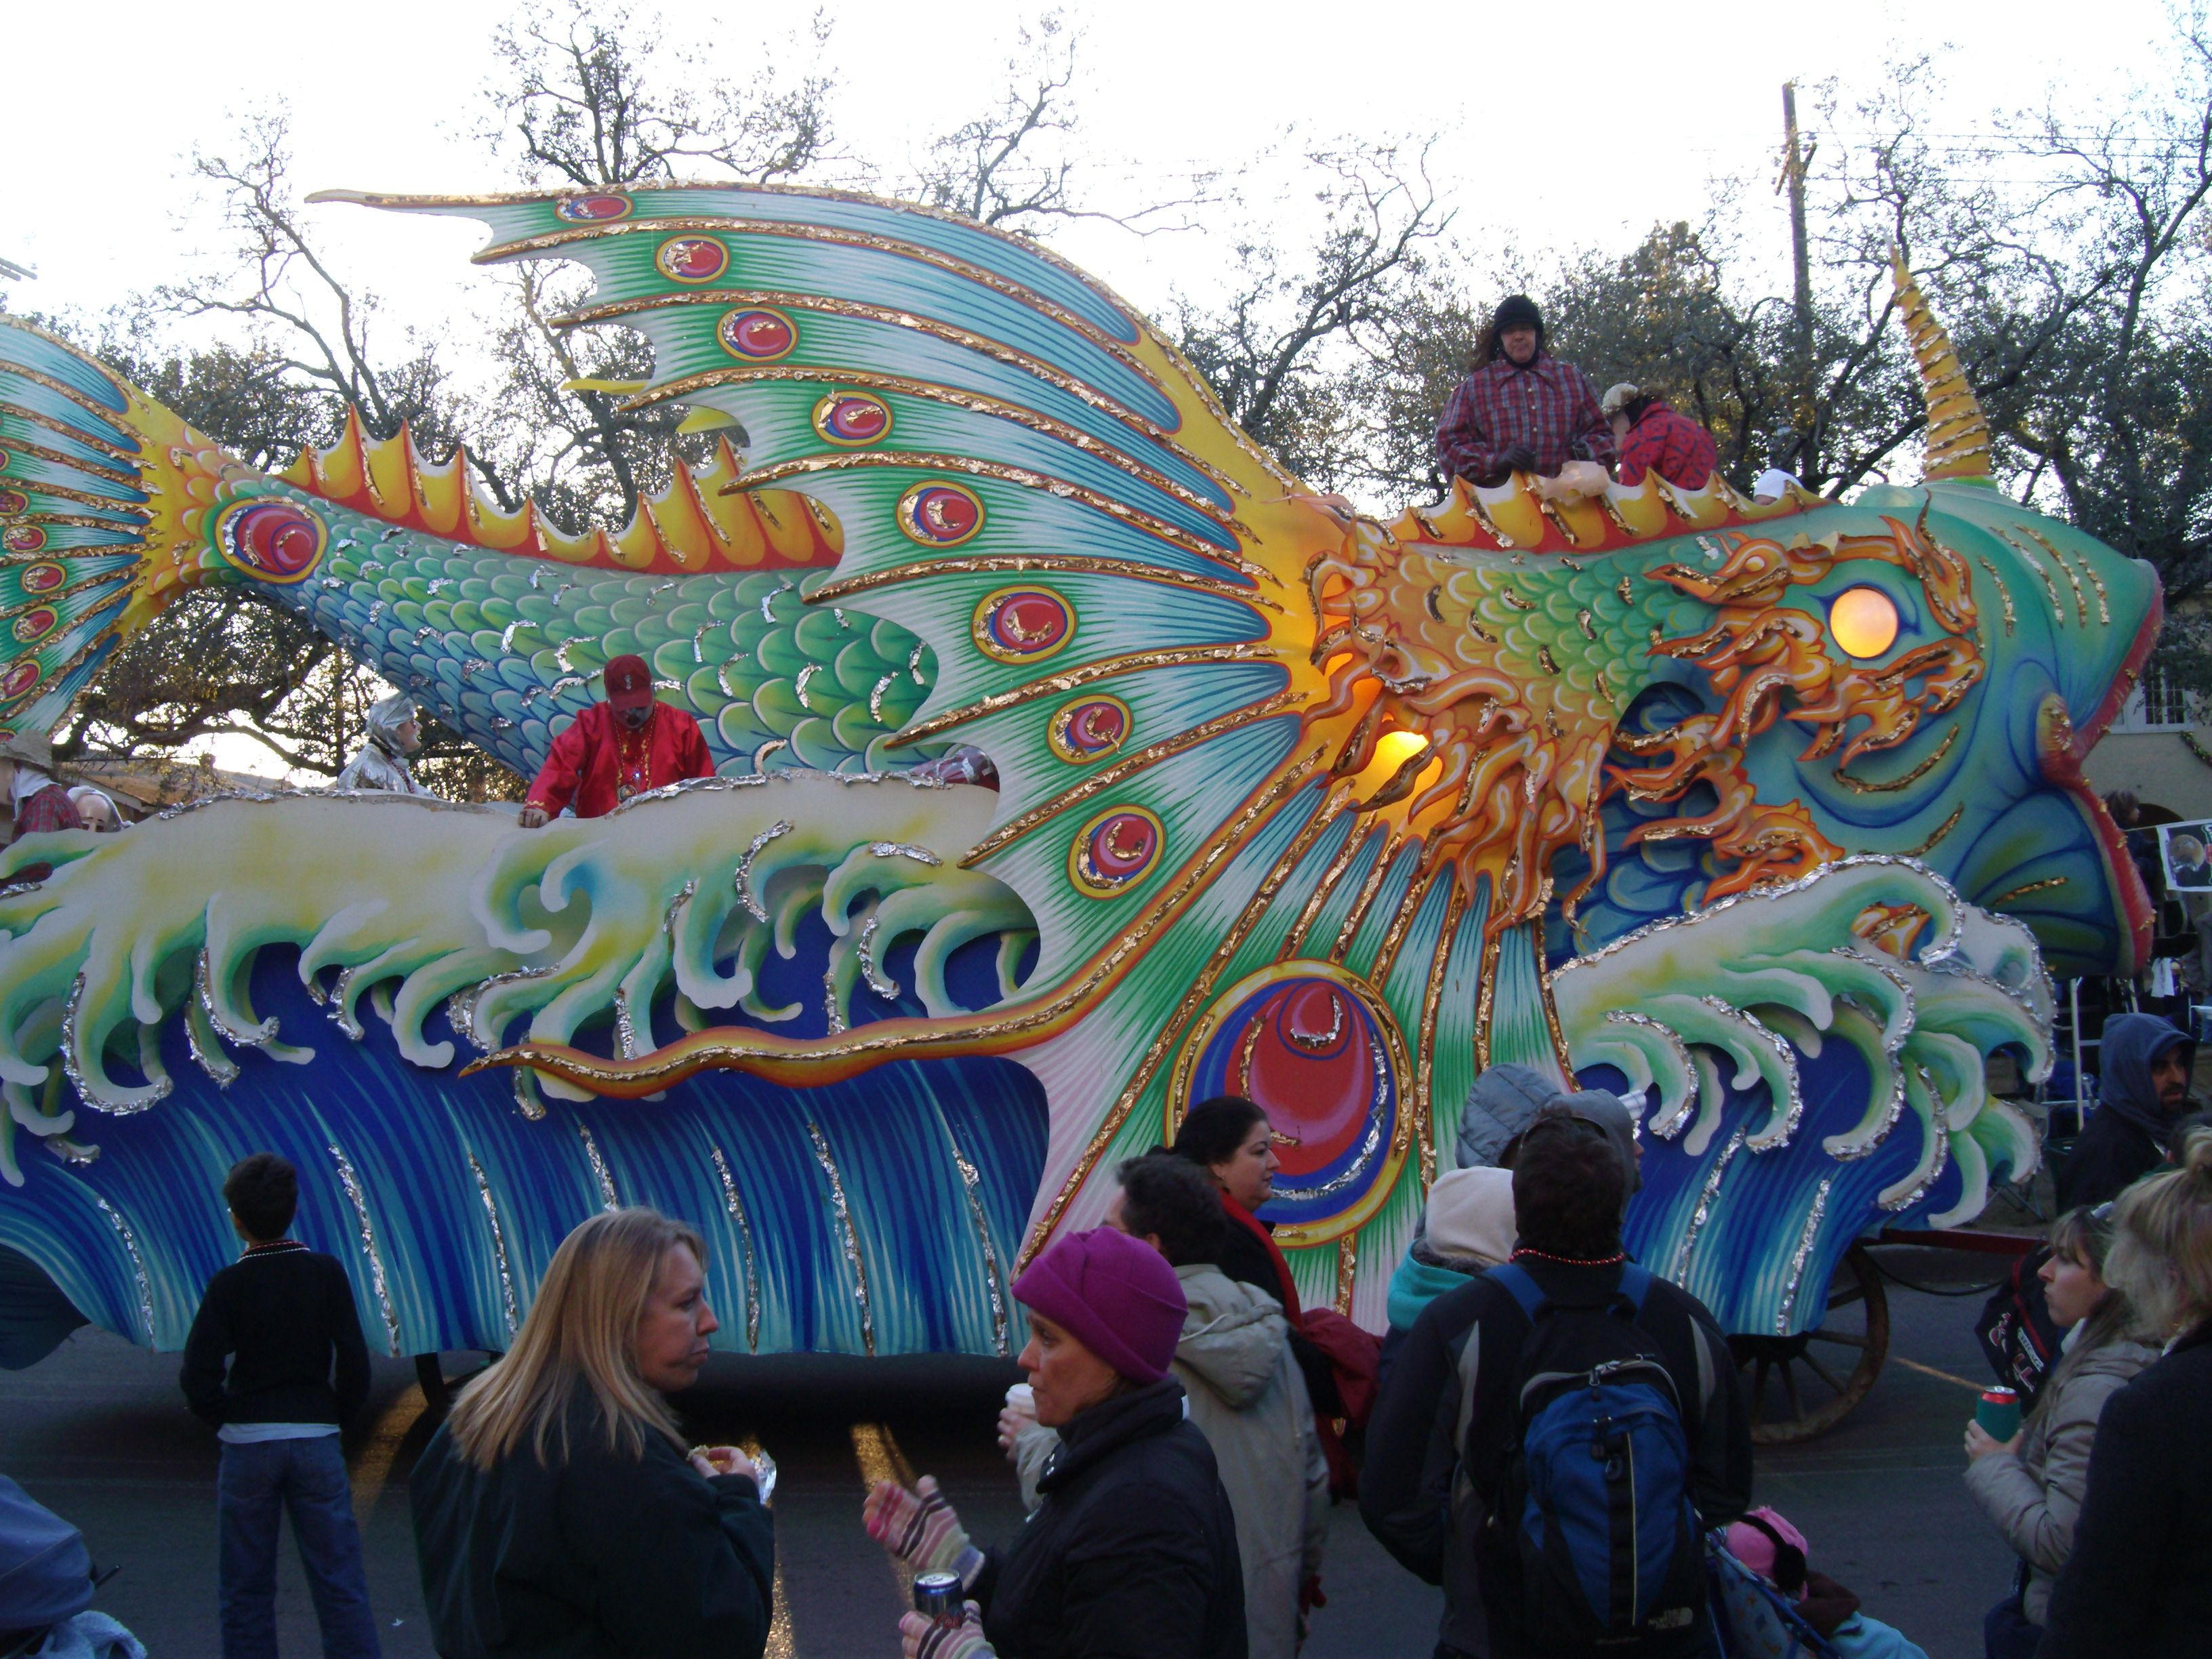 Carnival new orleans news mardi gras parade mardi gras